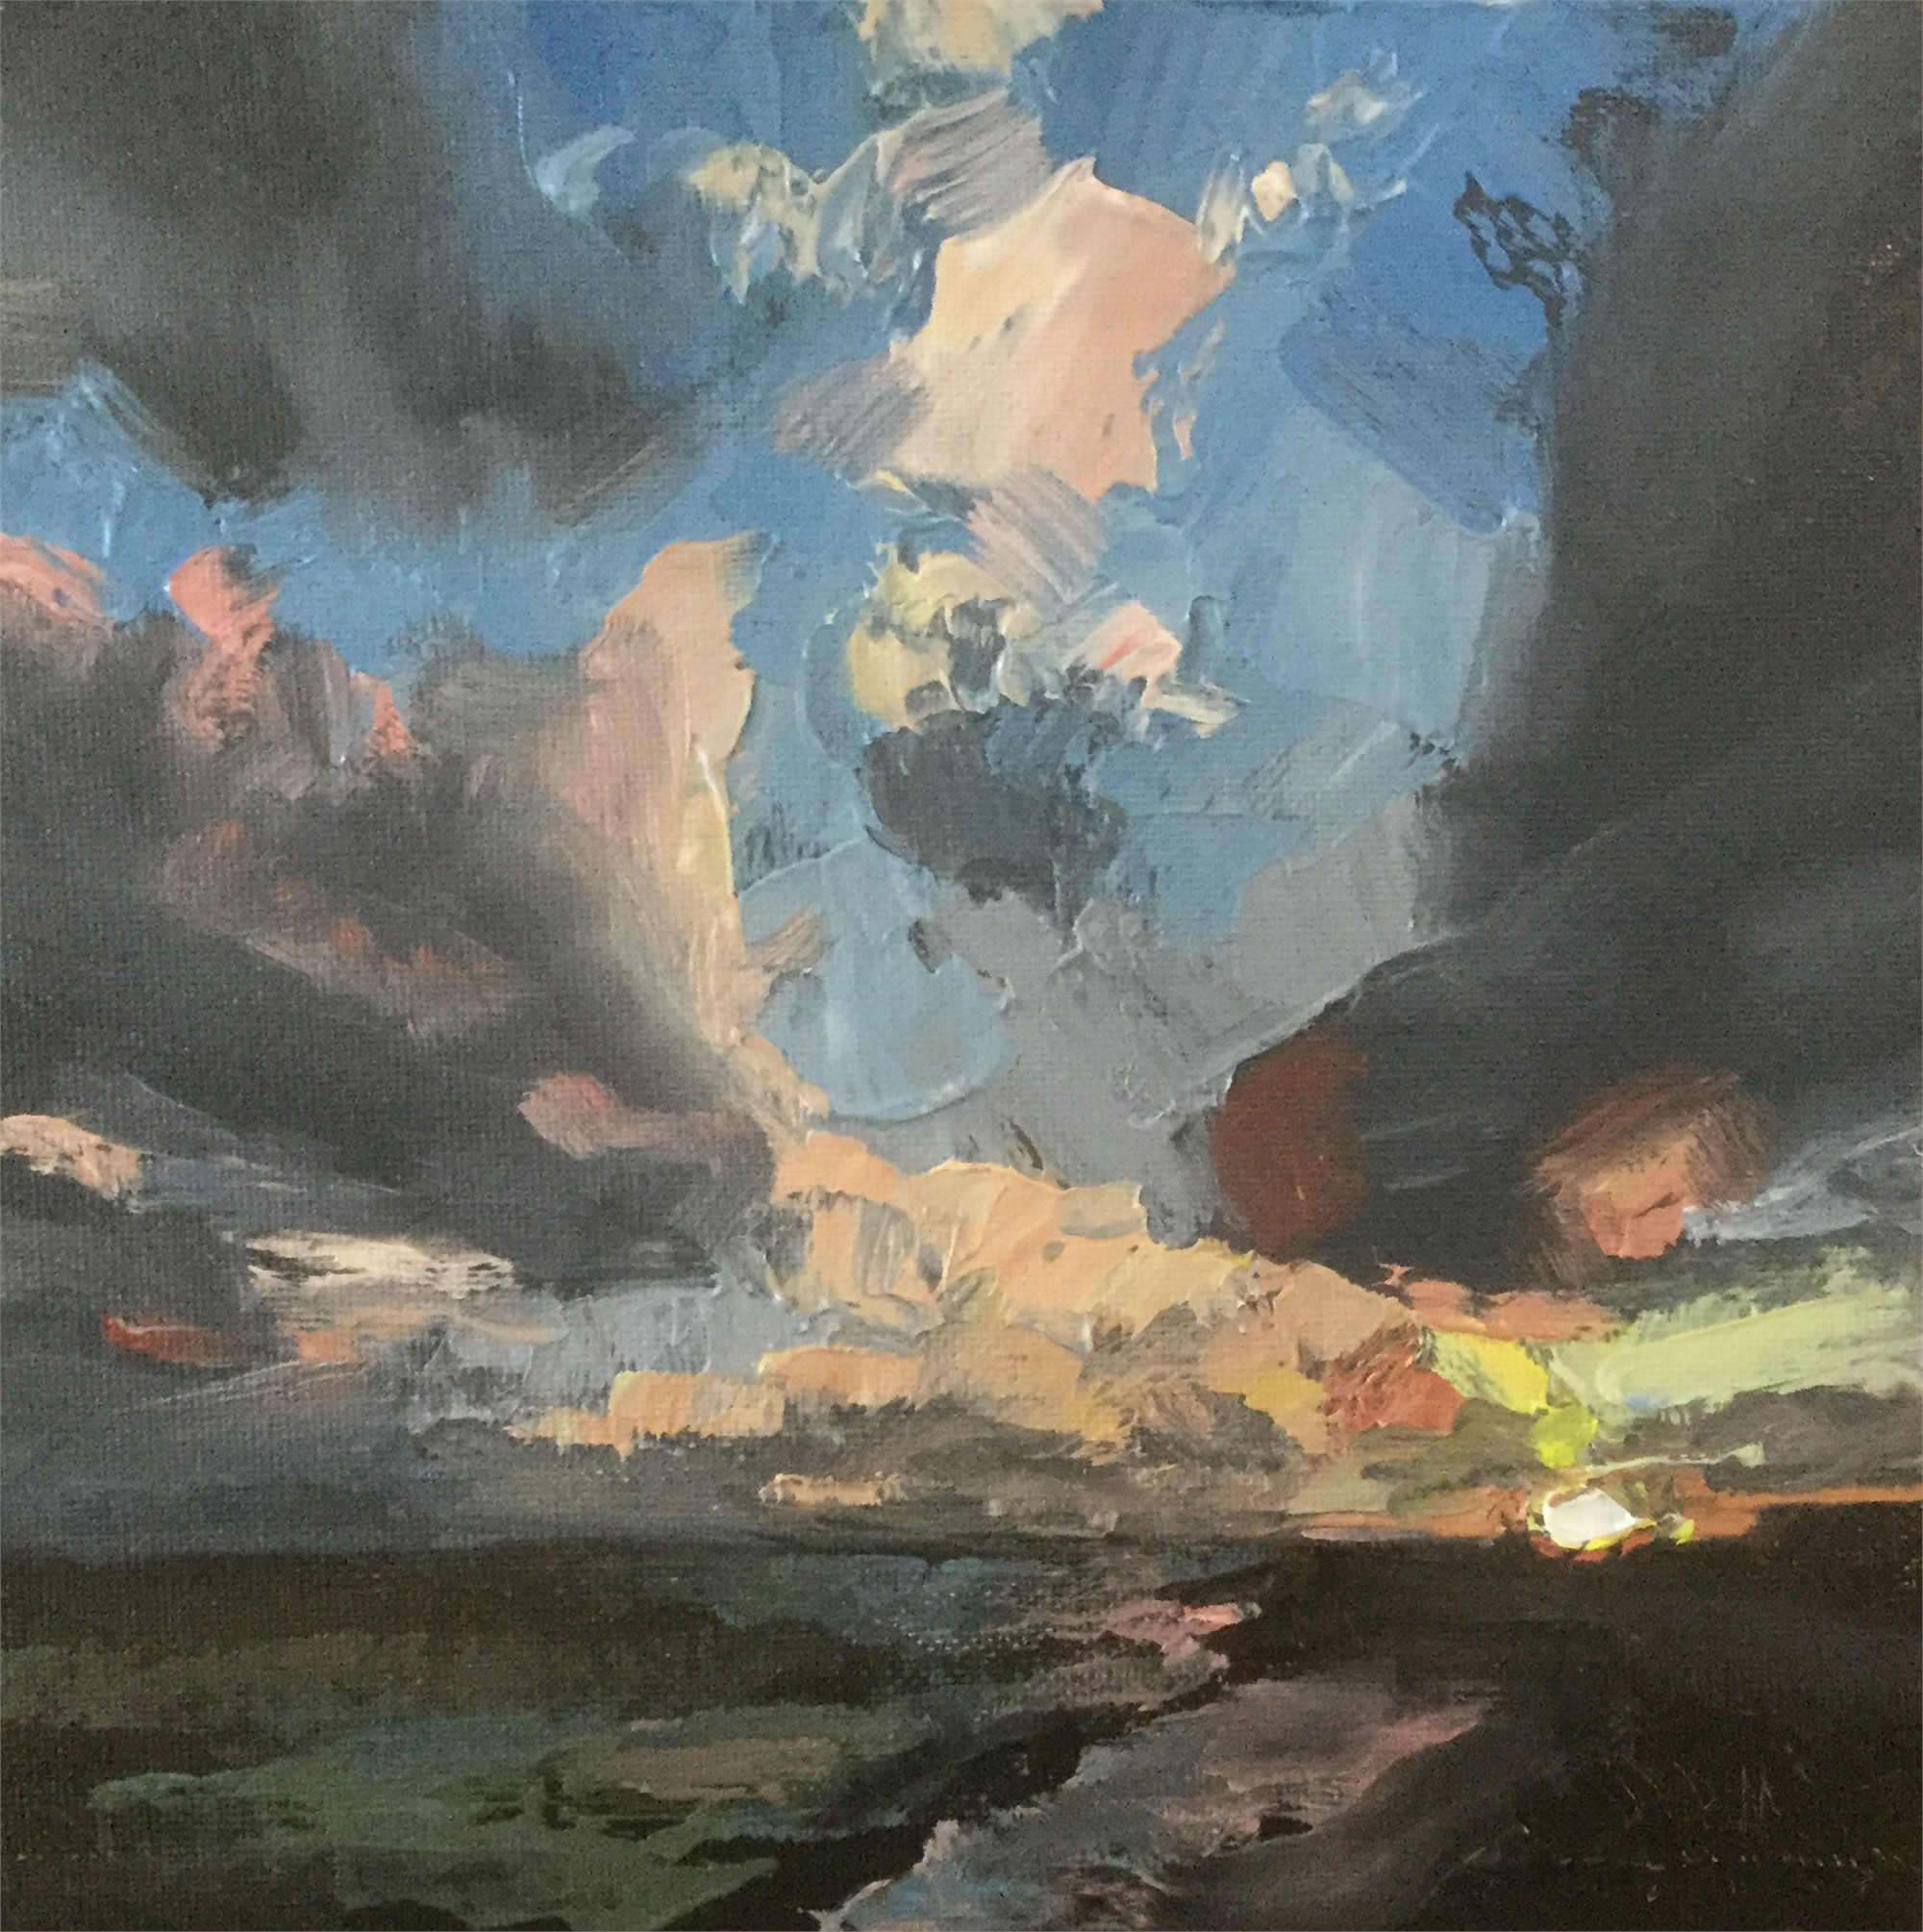 Sanibel Sunset 5 by C.W. Mundy